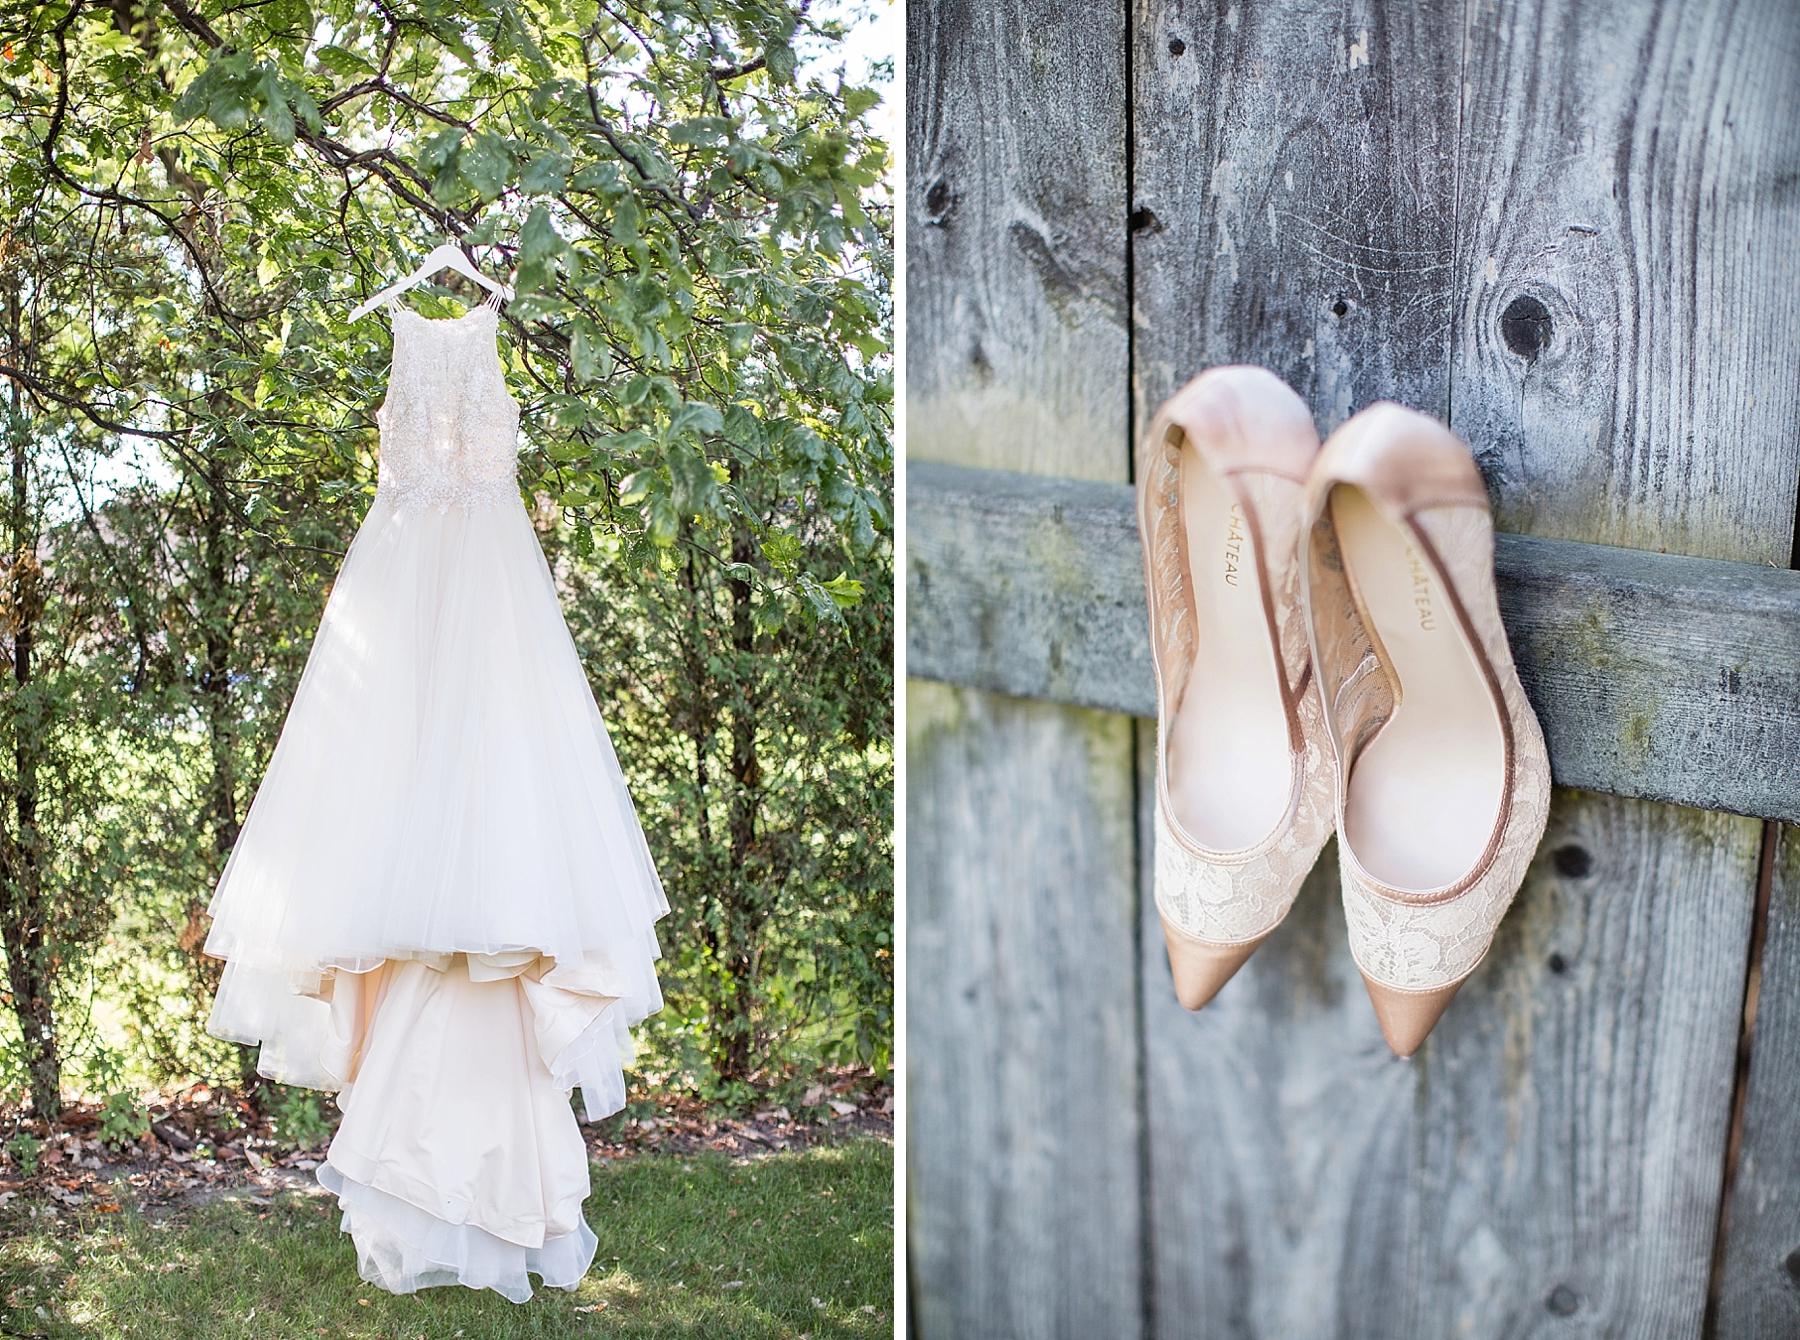 windsor-wedding-photographer-sprucewood-shores-winery-wedding-niagara-on-the-lake-wedding-photographer-eryn-shea-photography_0002.jpg